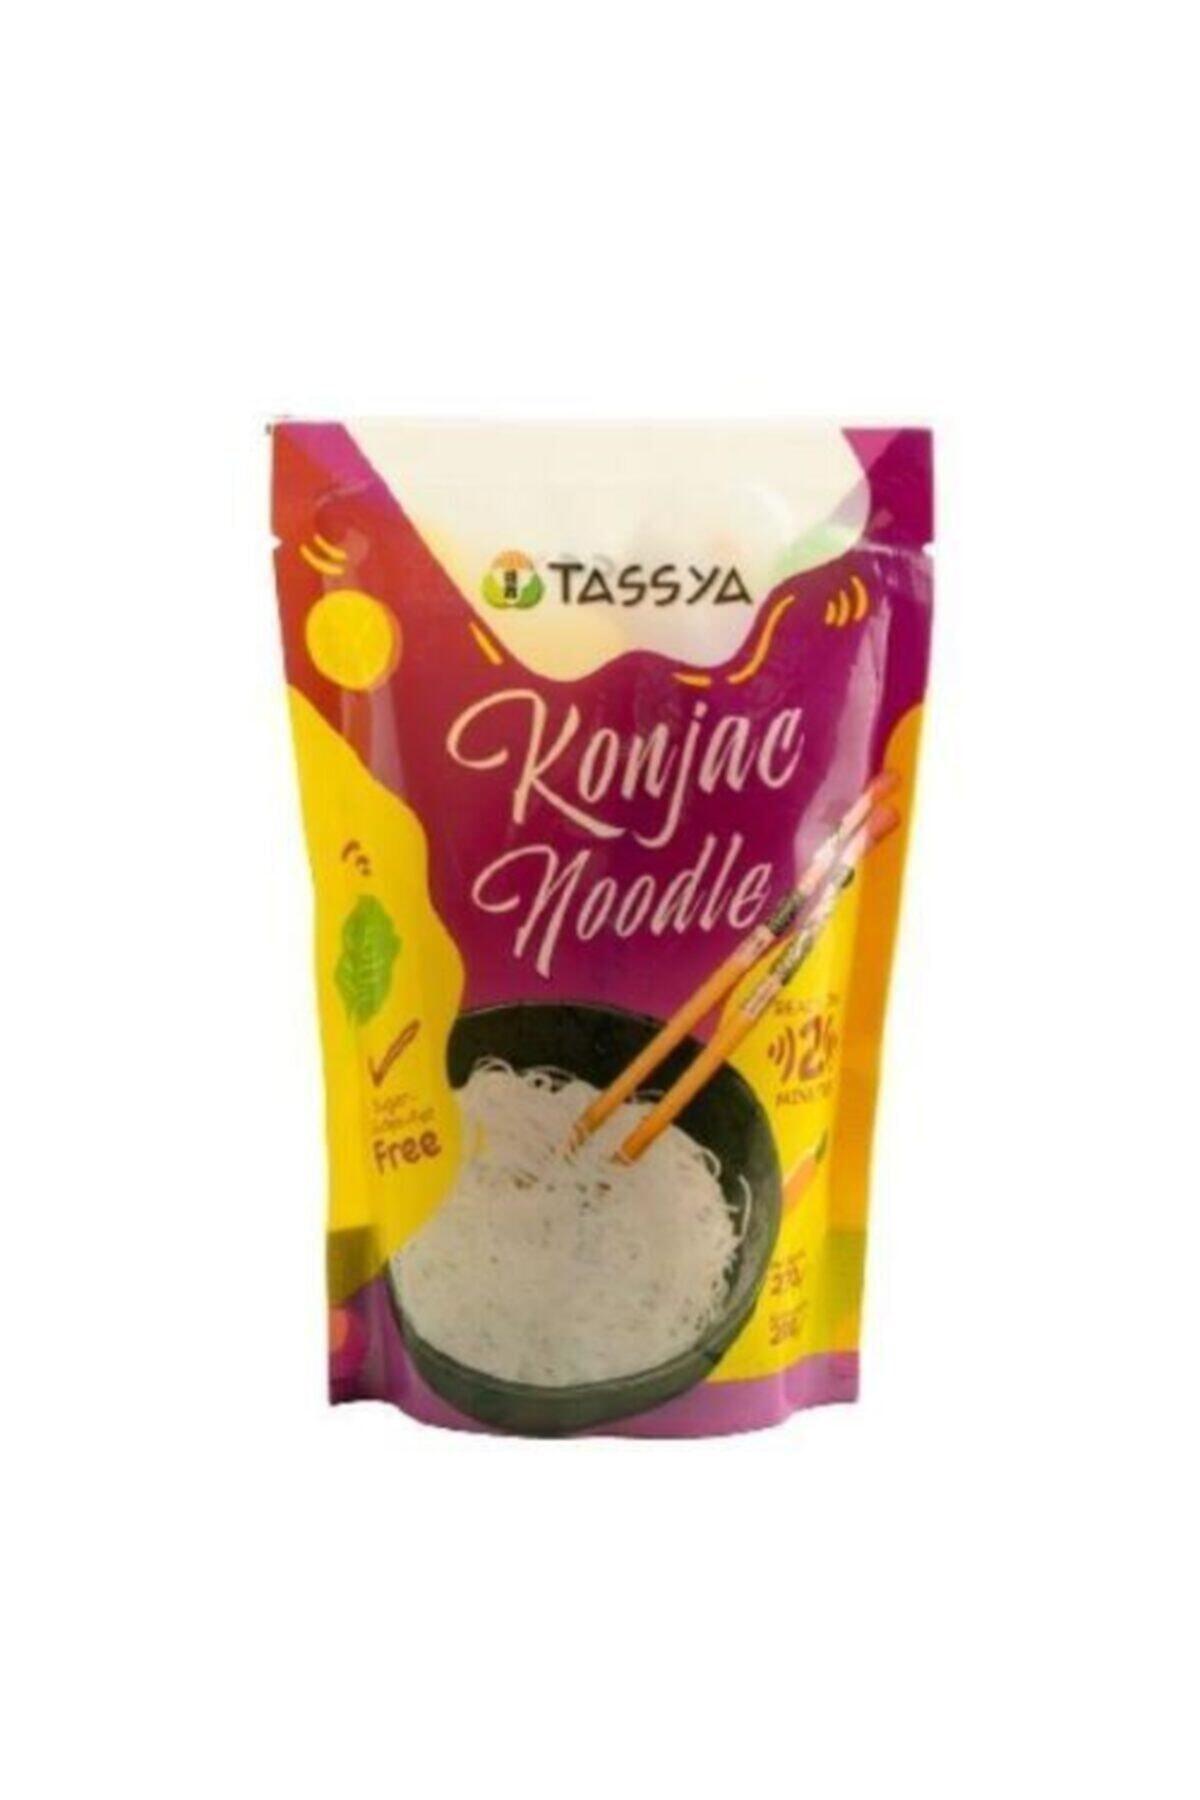 Tassya Shirataki (konjac) Noodle 270 G 1